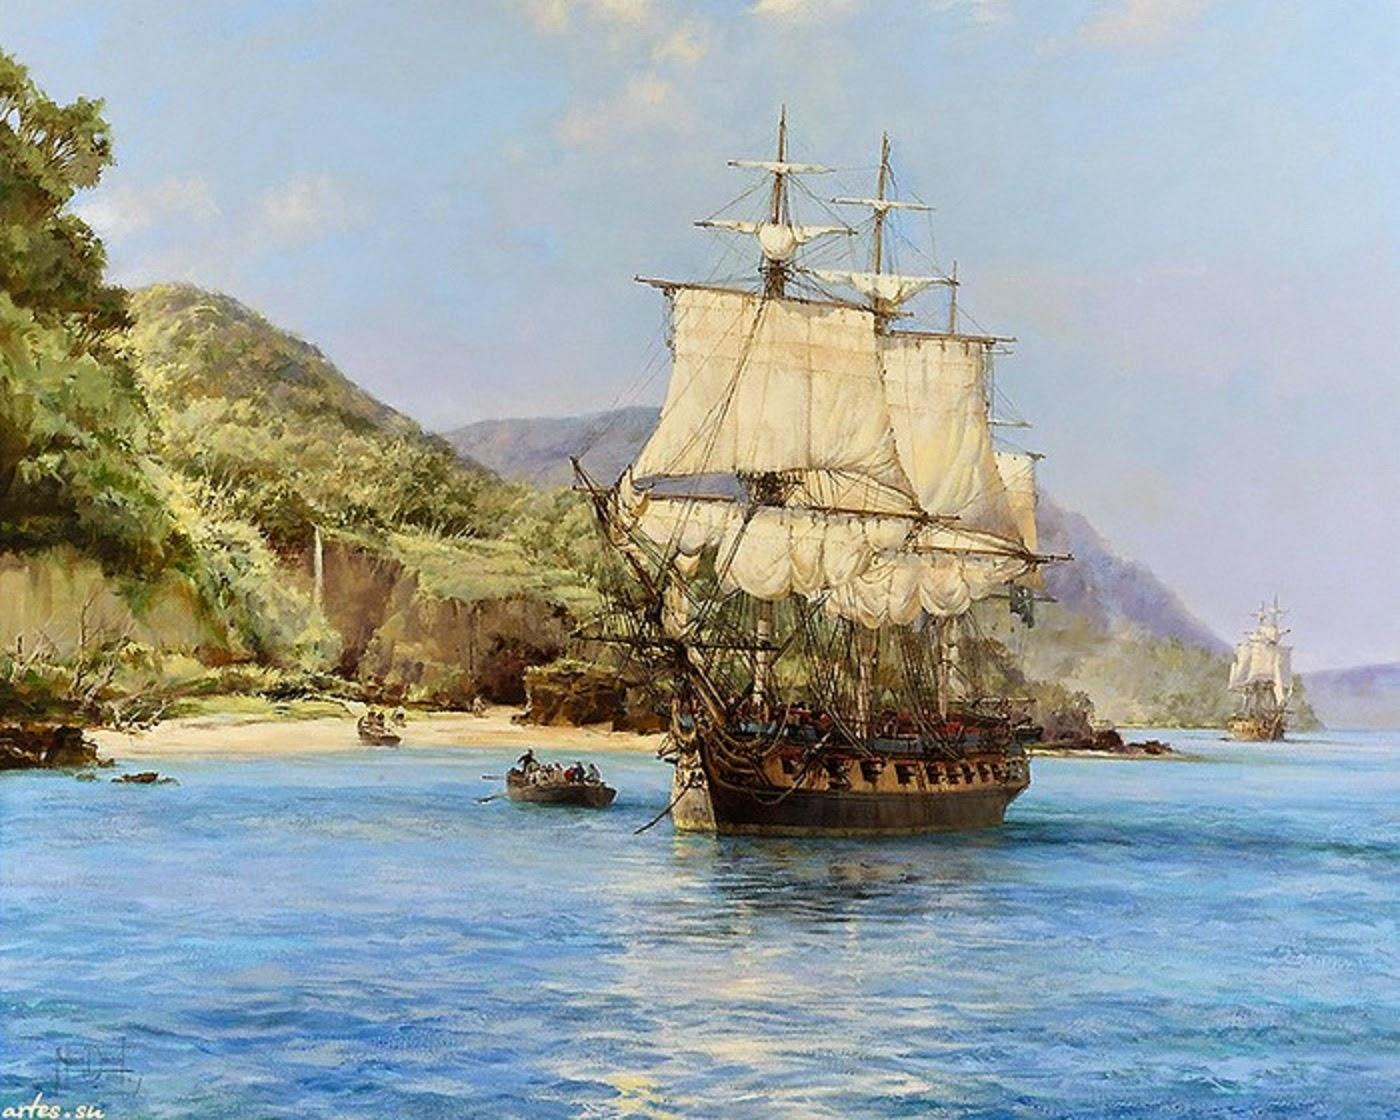 Pirate Ship Wallpaper Hd Very Beautiful Ship Images Hd Wallpaper All 4u Wallpaper